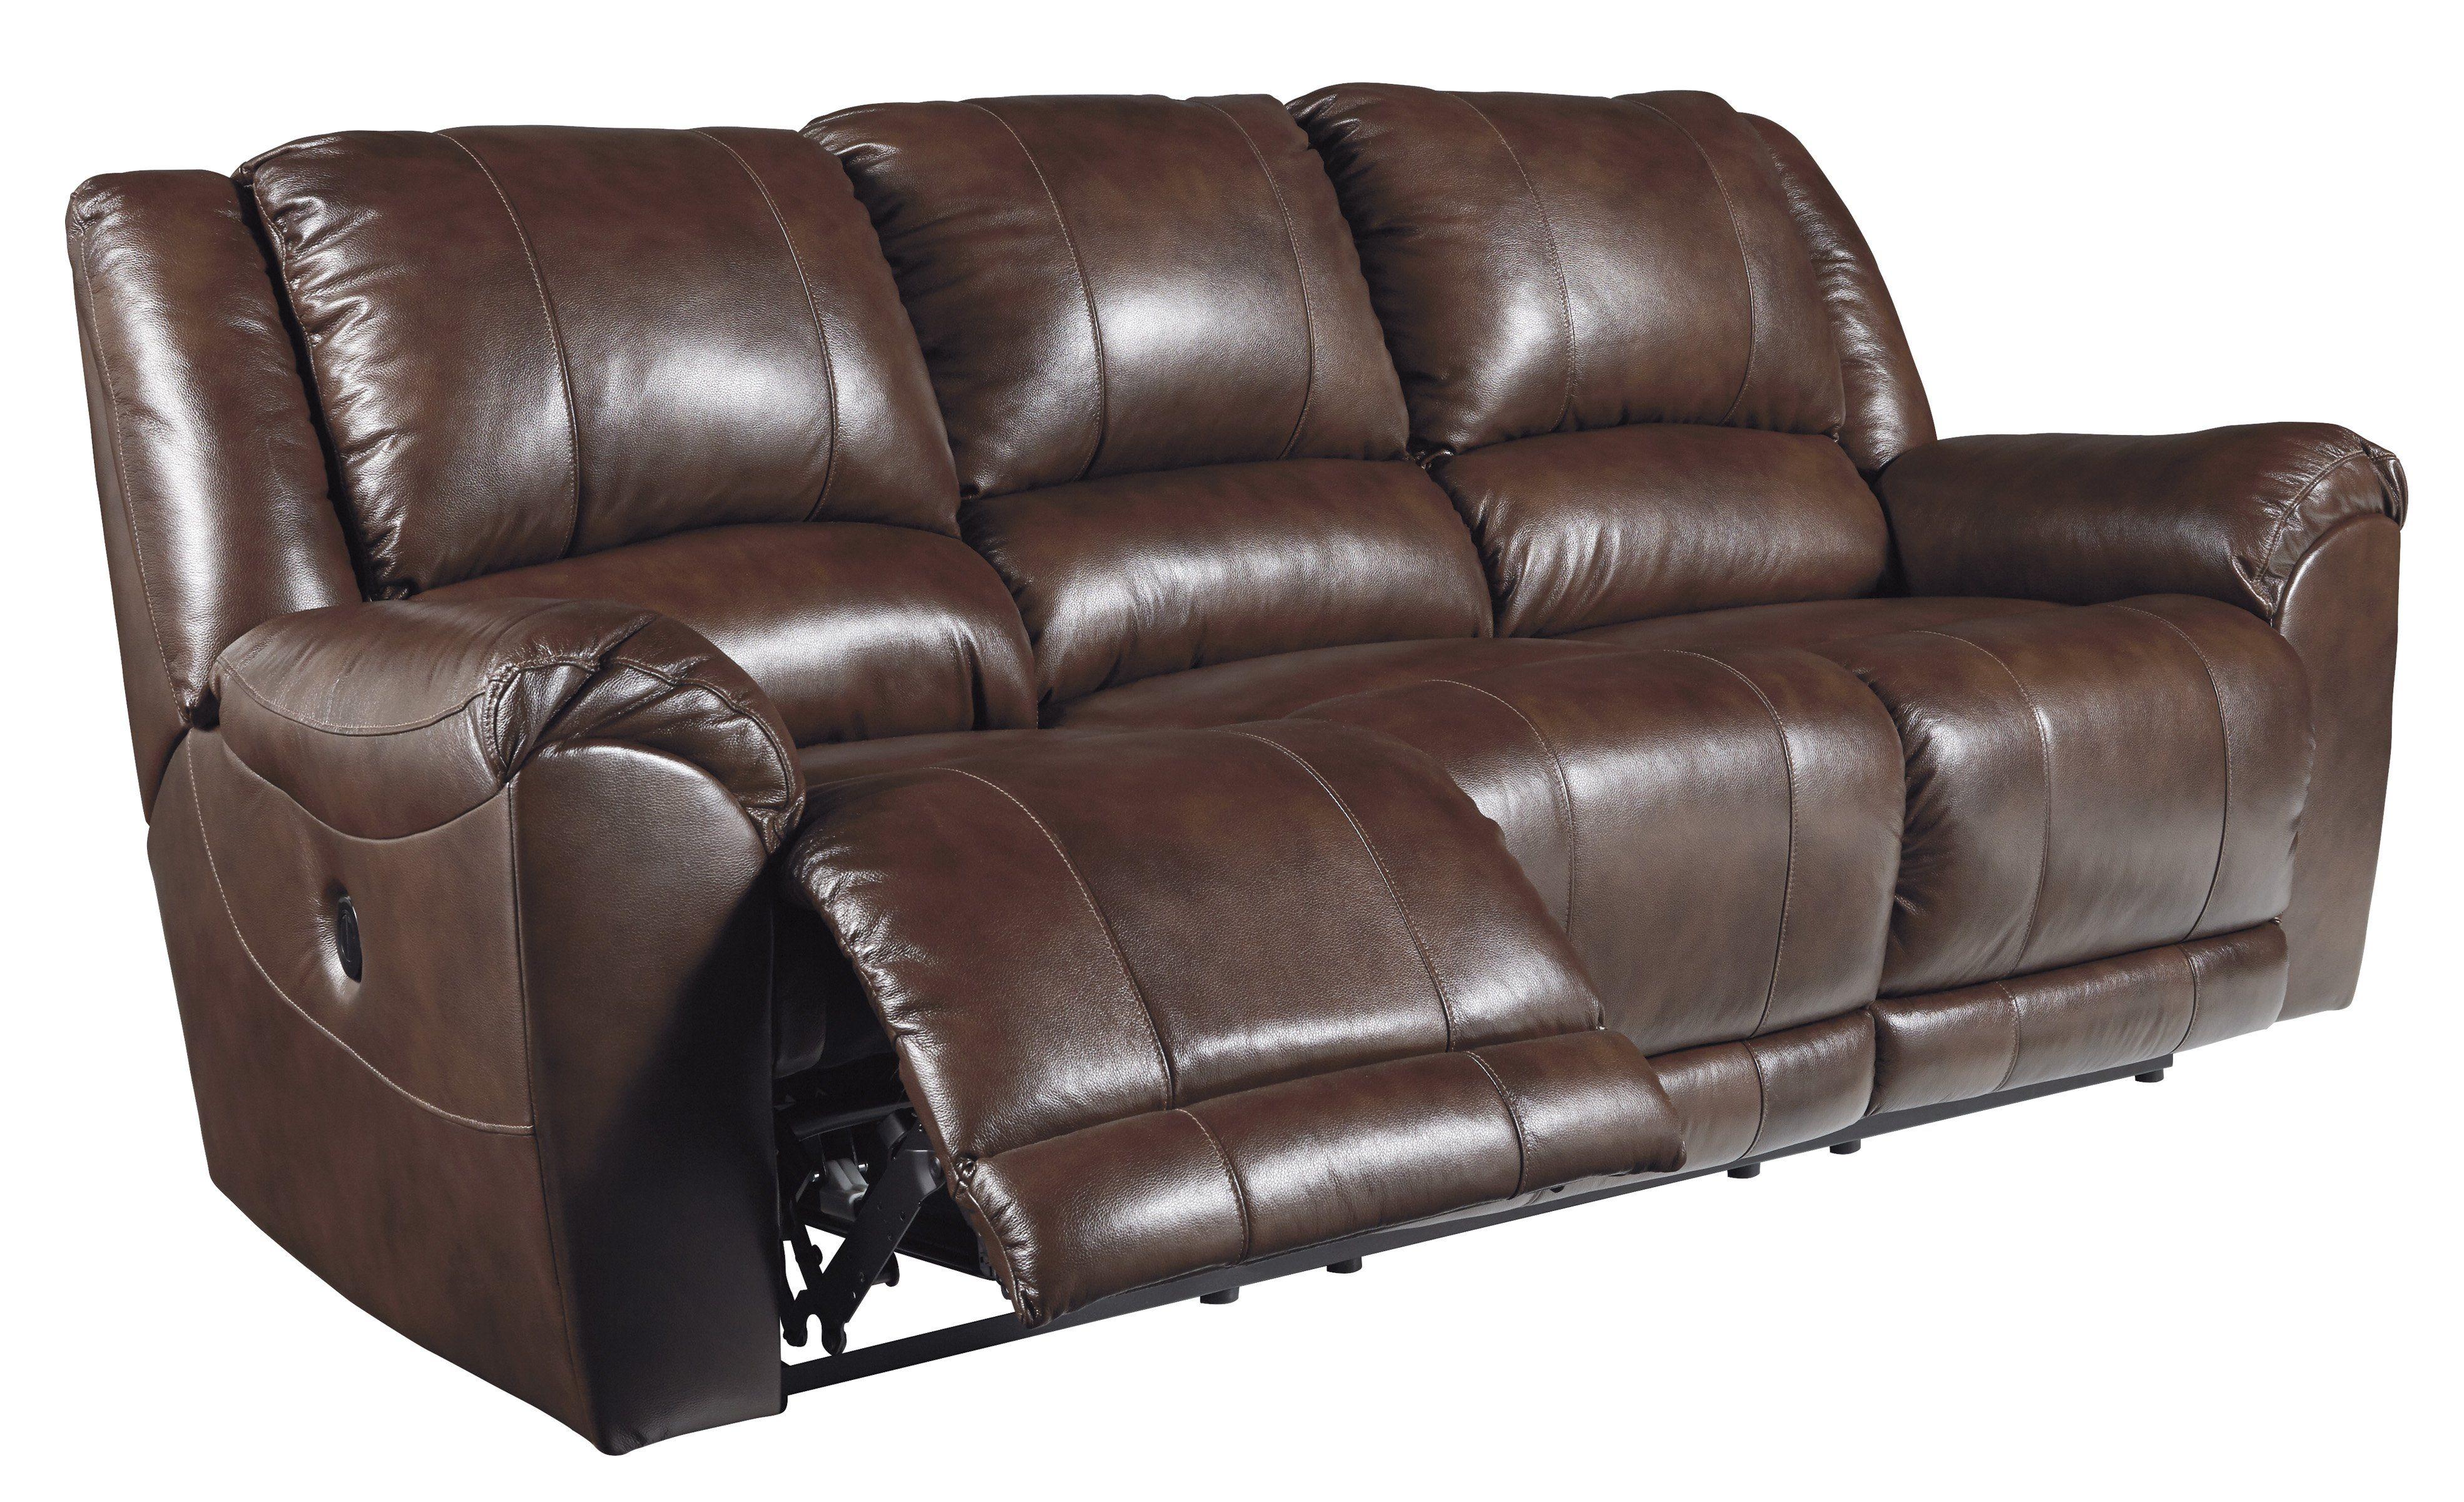 Pleasing Persiphone Power Reclining Sofa Genuine Leather Theyellowbook Wood Chair Design Ideas Theyellowbookinfo